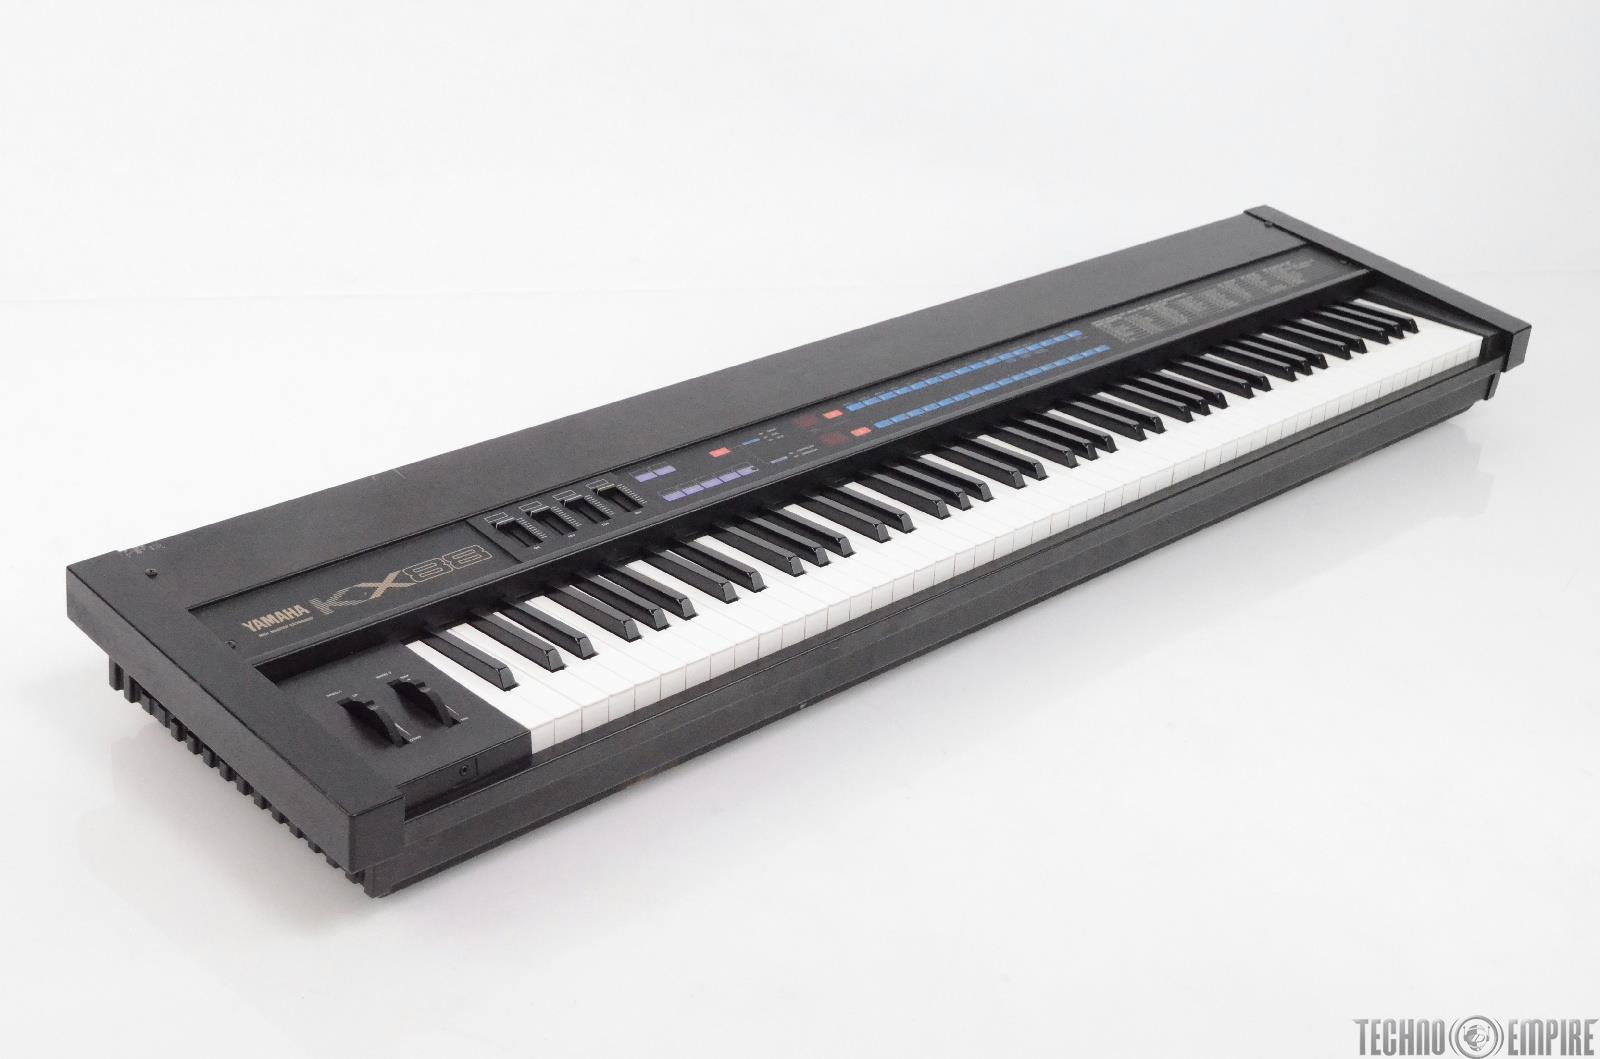 yamaha kx88 midi master 88 key weighted keyboard controller w case rh technoempire com yamaha kx88 service manual yamaha kx88 service manual